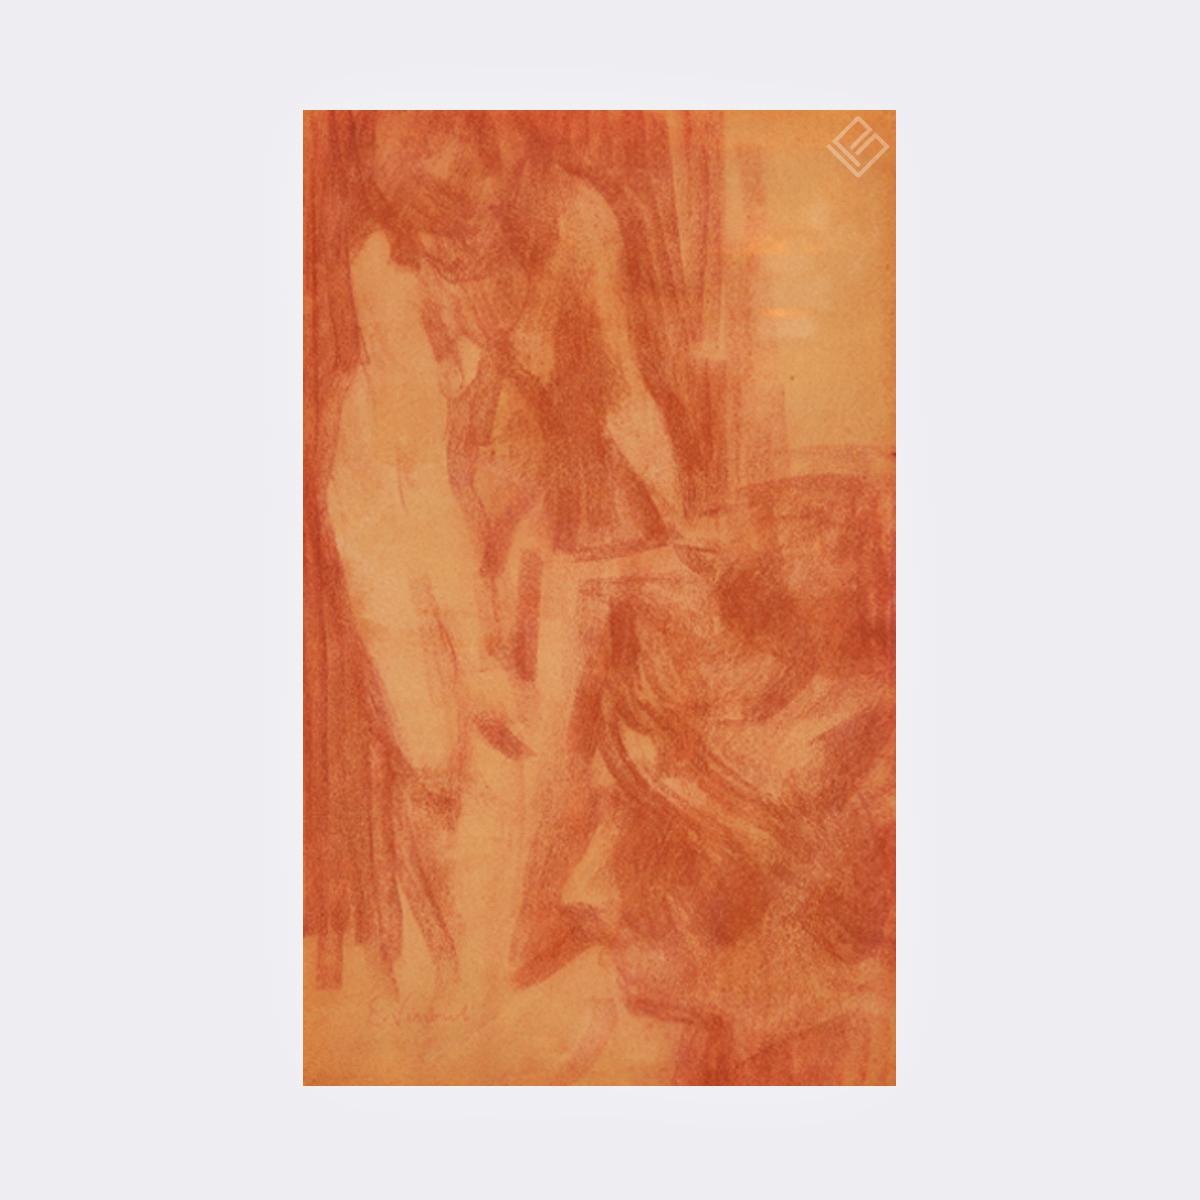 GP-P21009 – Eliseu Visconti – Nu e Rosto – Sanguinea 42,5×25,5cm site1